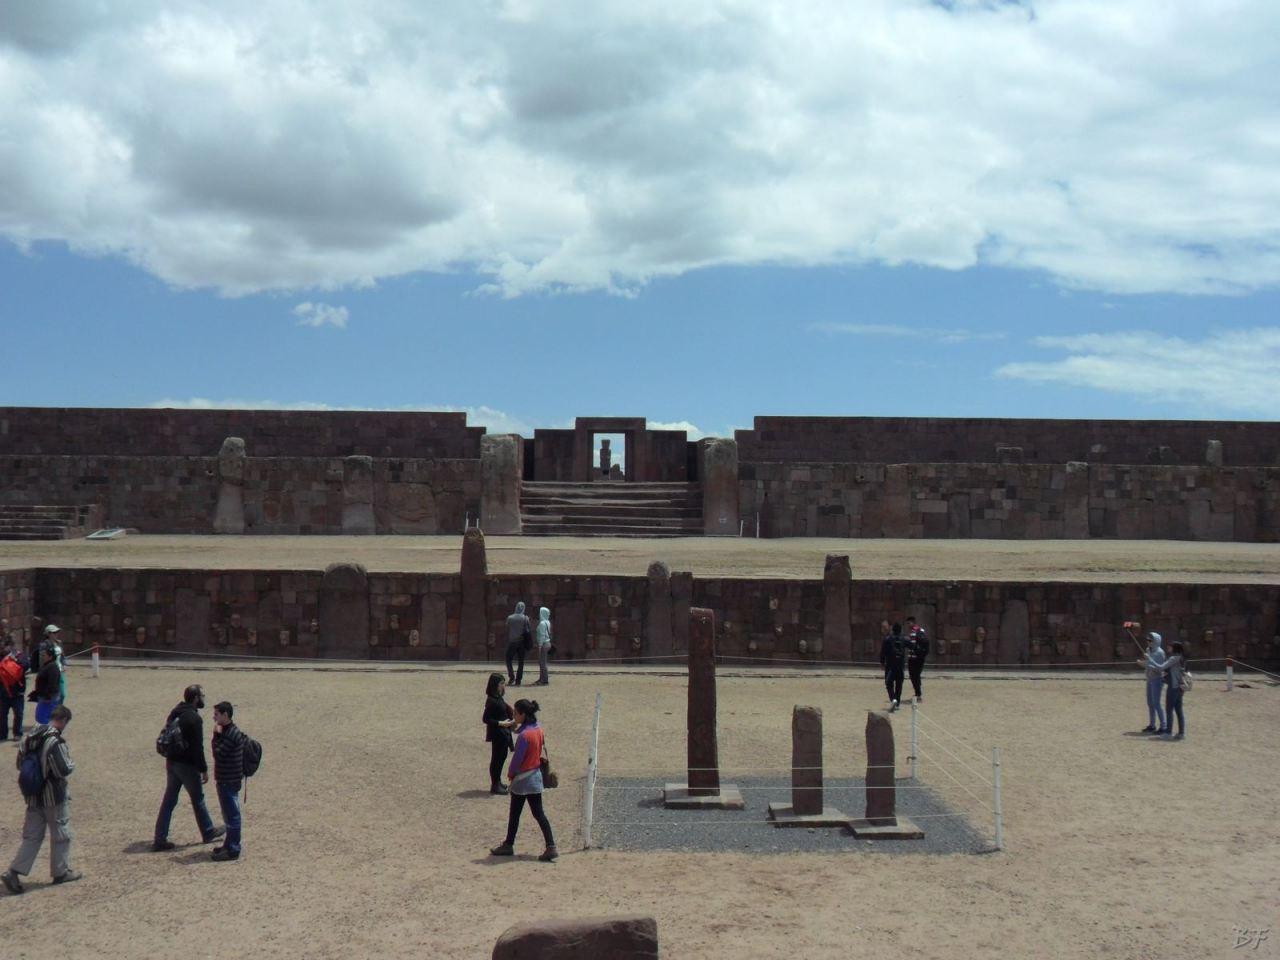 Sito-Megalitico-Piramide-Akapana-Kalasasaya-Menhir-Tiahuanaco-Bolivia-99